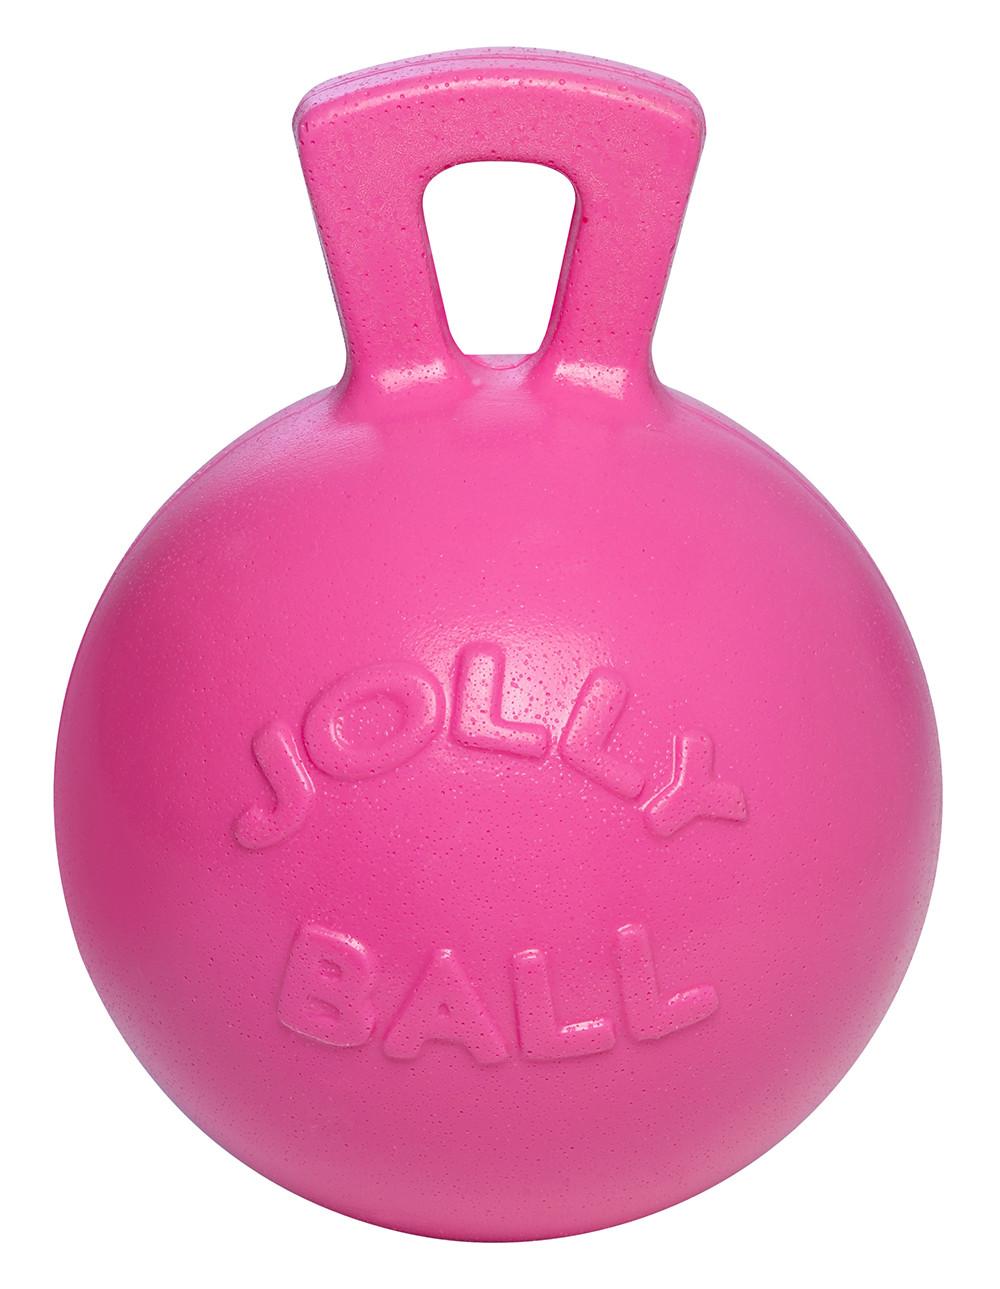 Jolly Ball met geur <br>25 cm